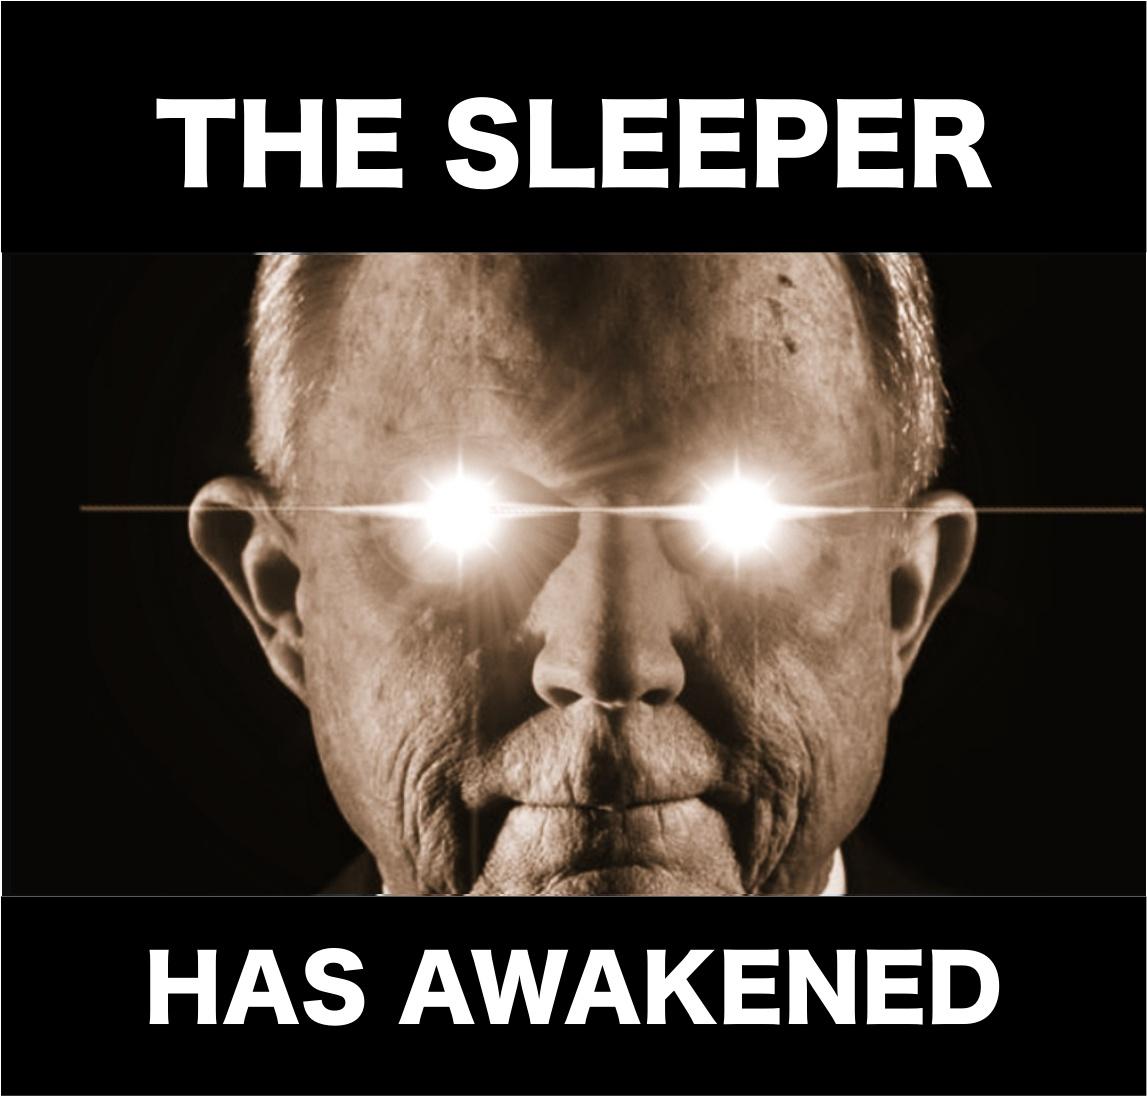 A Legend Exposed, a Renegade in the Killbox, and THE SLEEPER HAS AWAKENED! #RELEASETHETEXTS #QAnon #NewQ #GreatAwakening